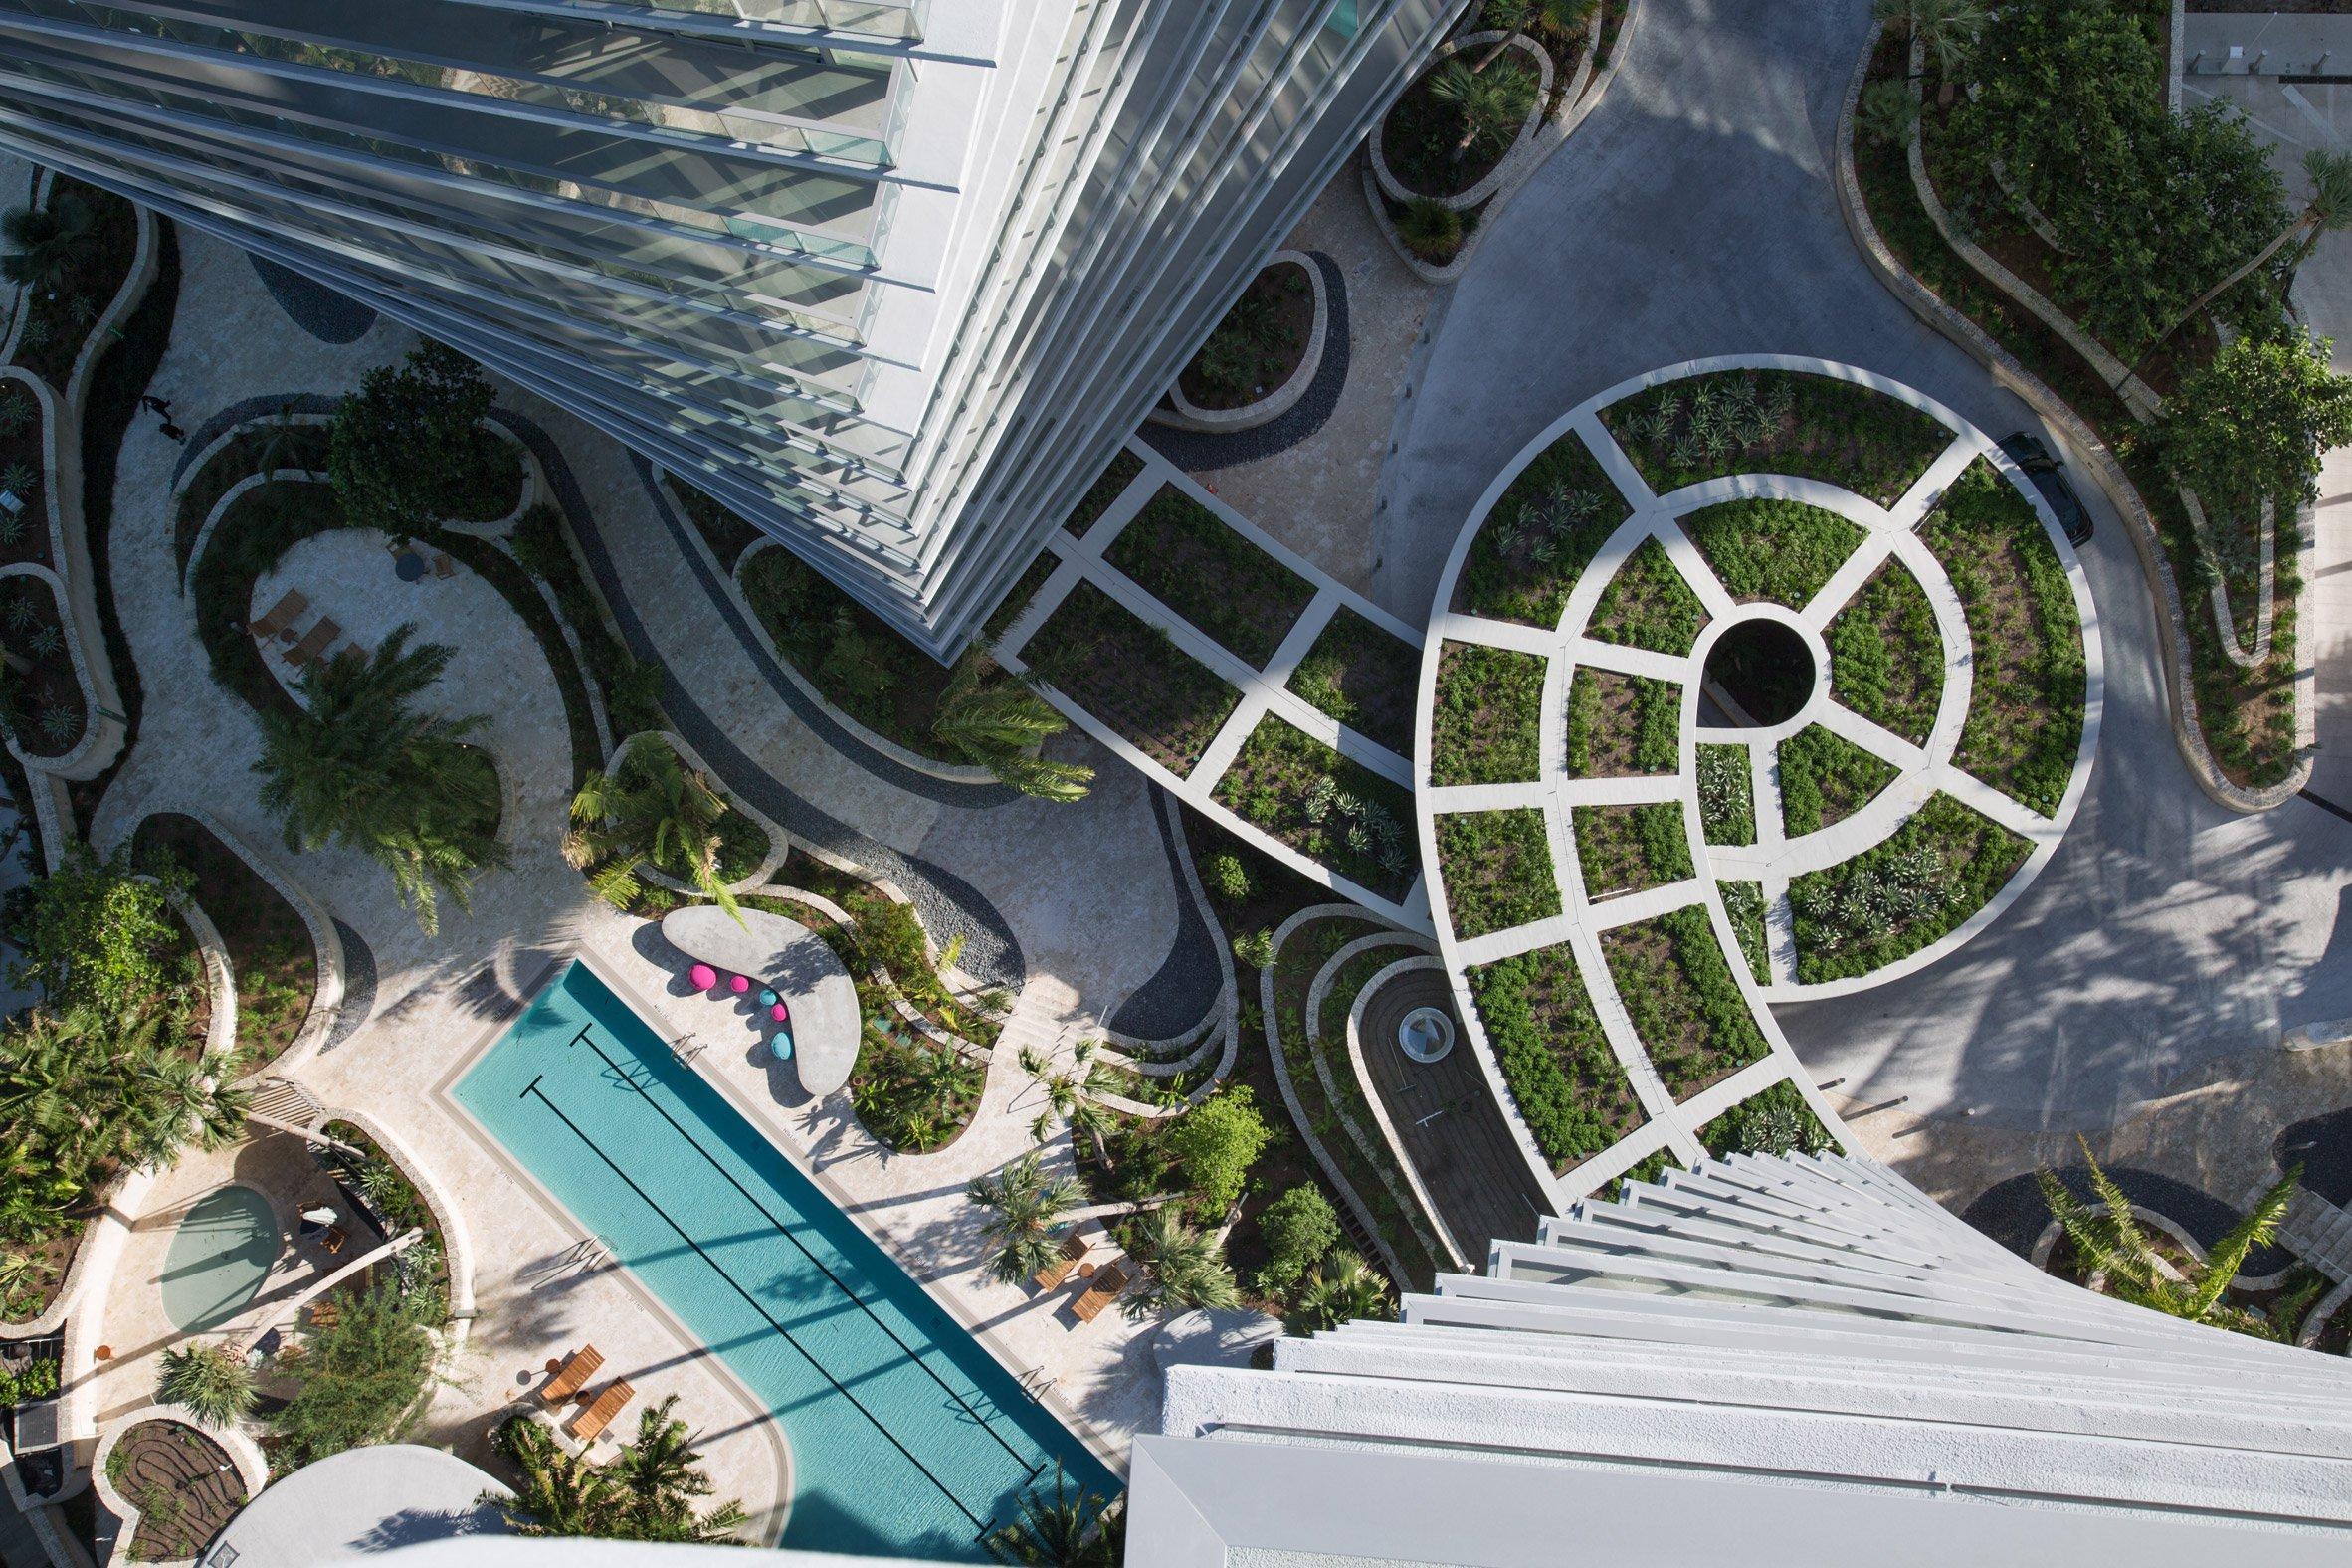 twisting-towers-by-bjarke-ingels-architecture-nyc_dezeen_2364_col_4